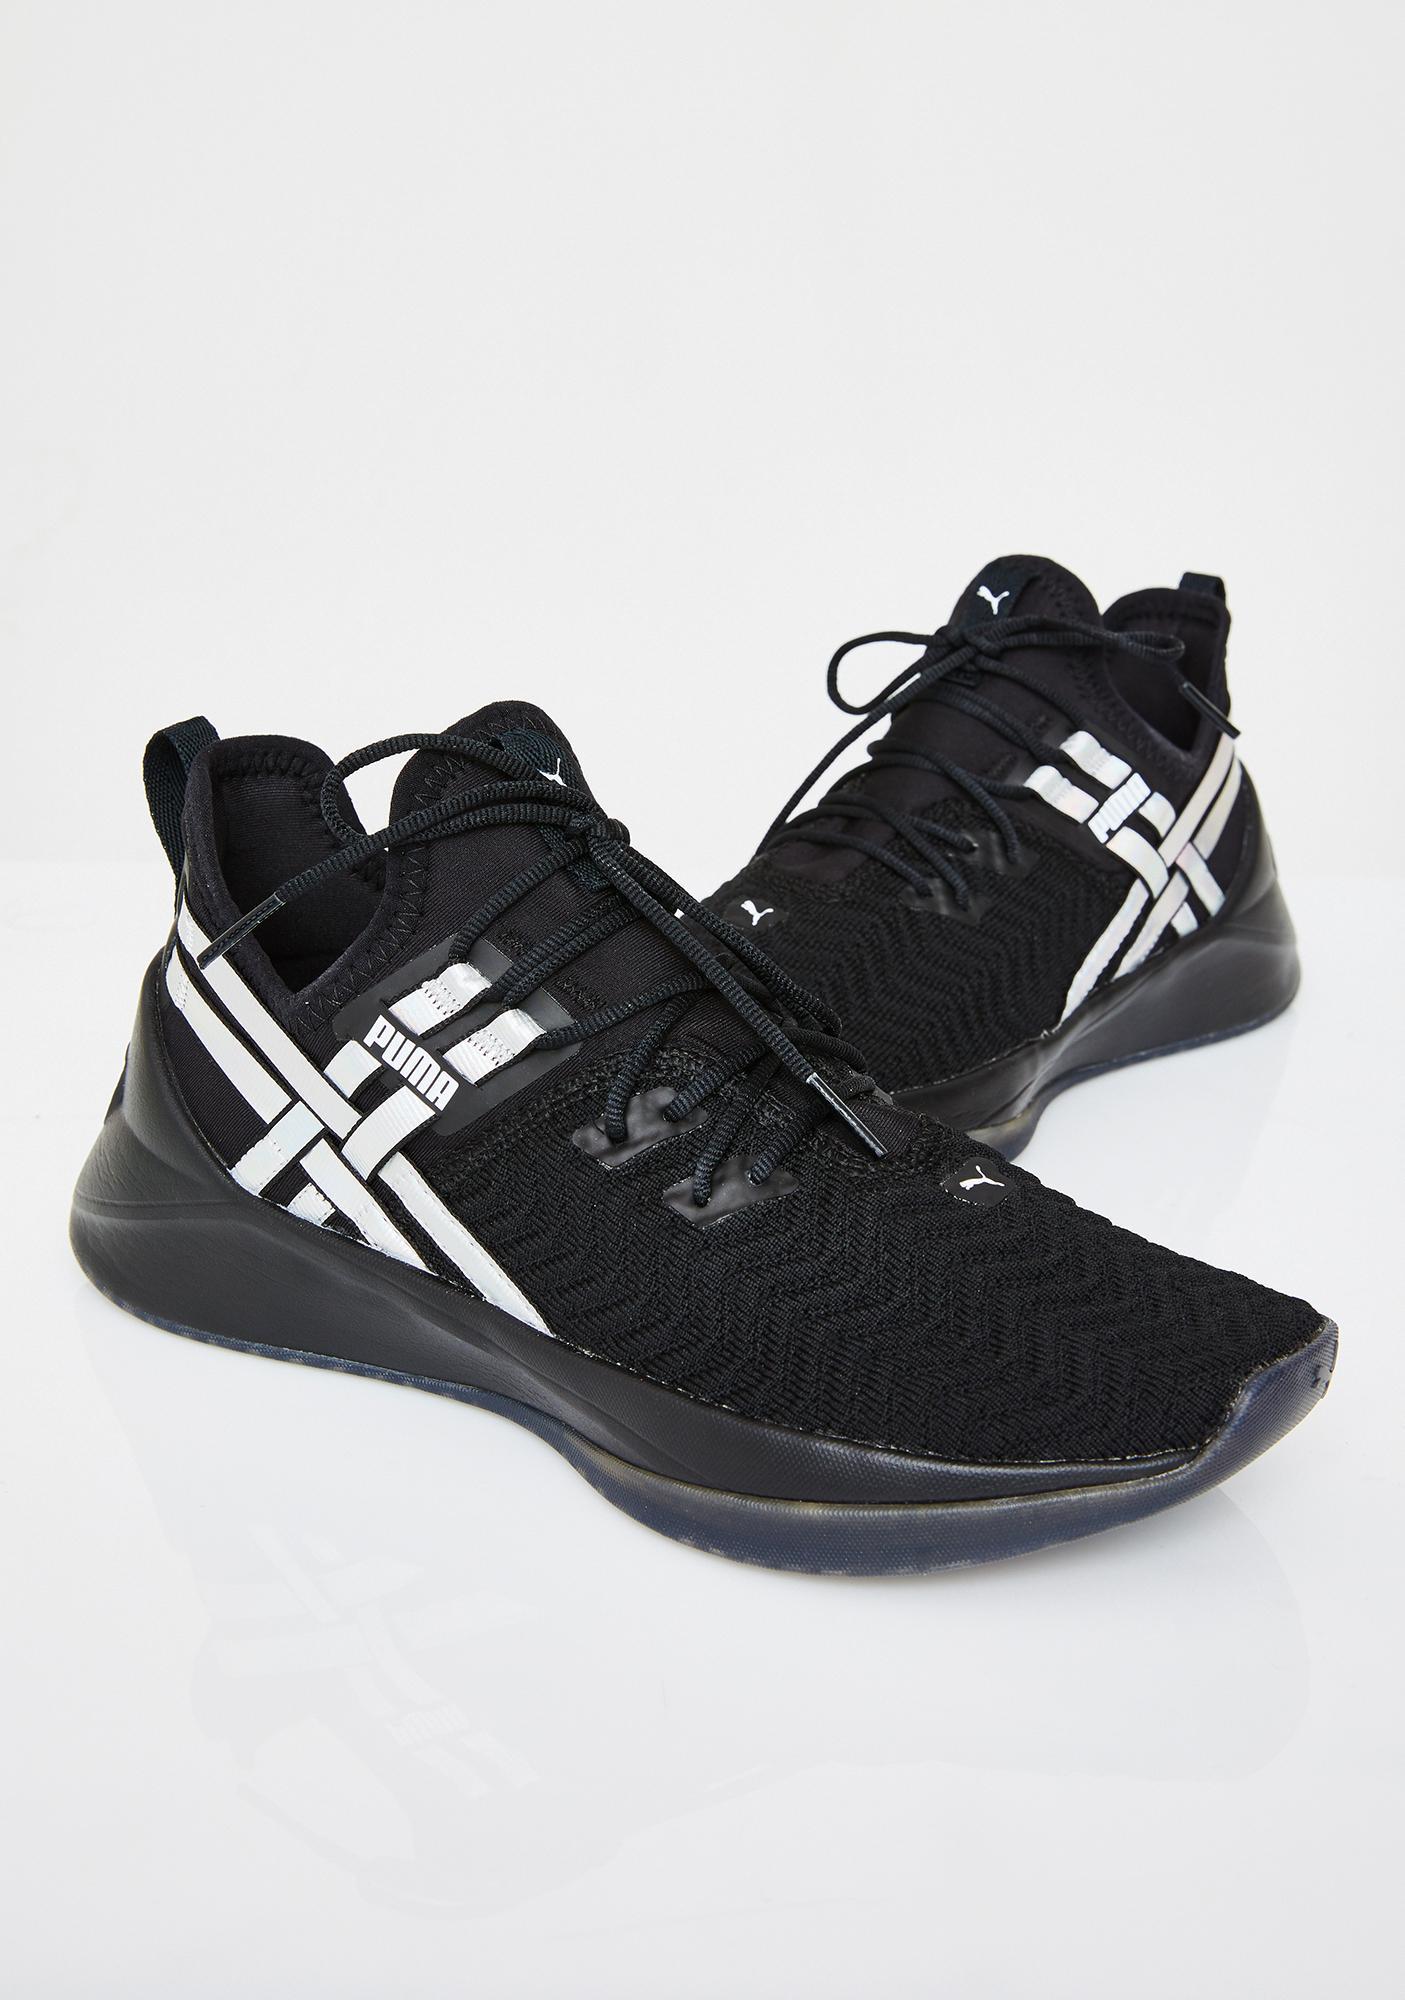 PUMA Jaab XT Iridescent TZ Sneakers